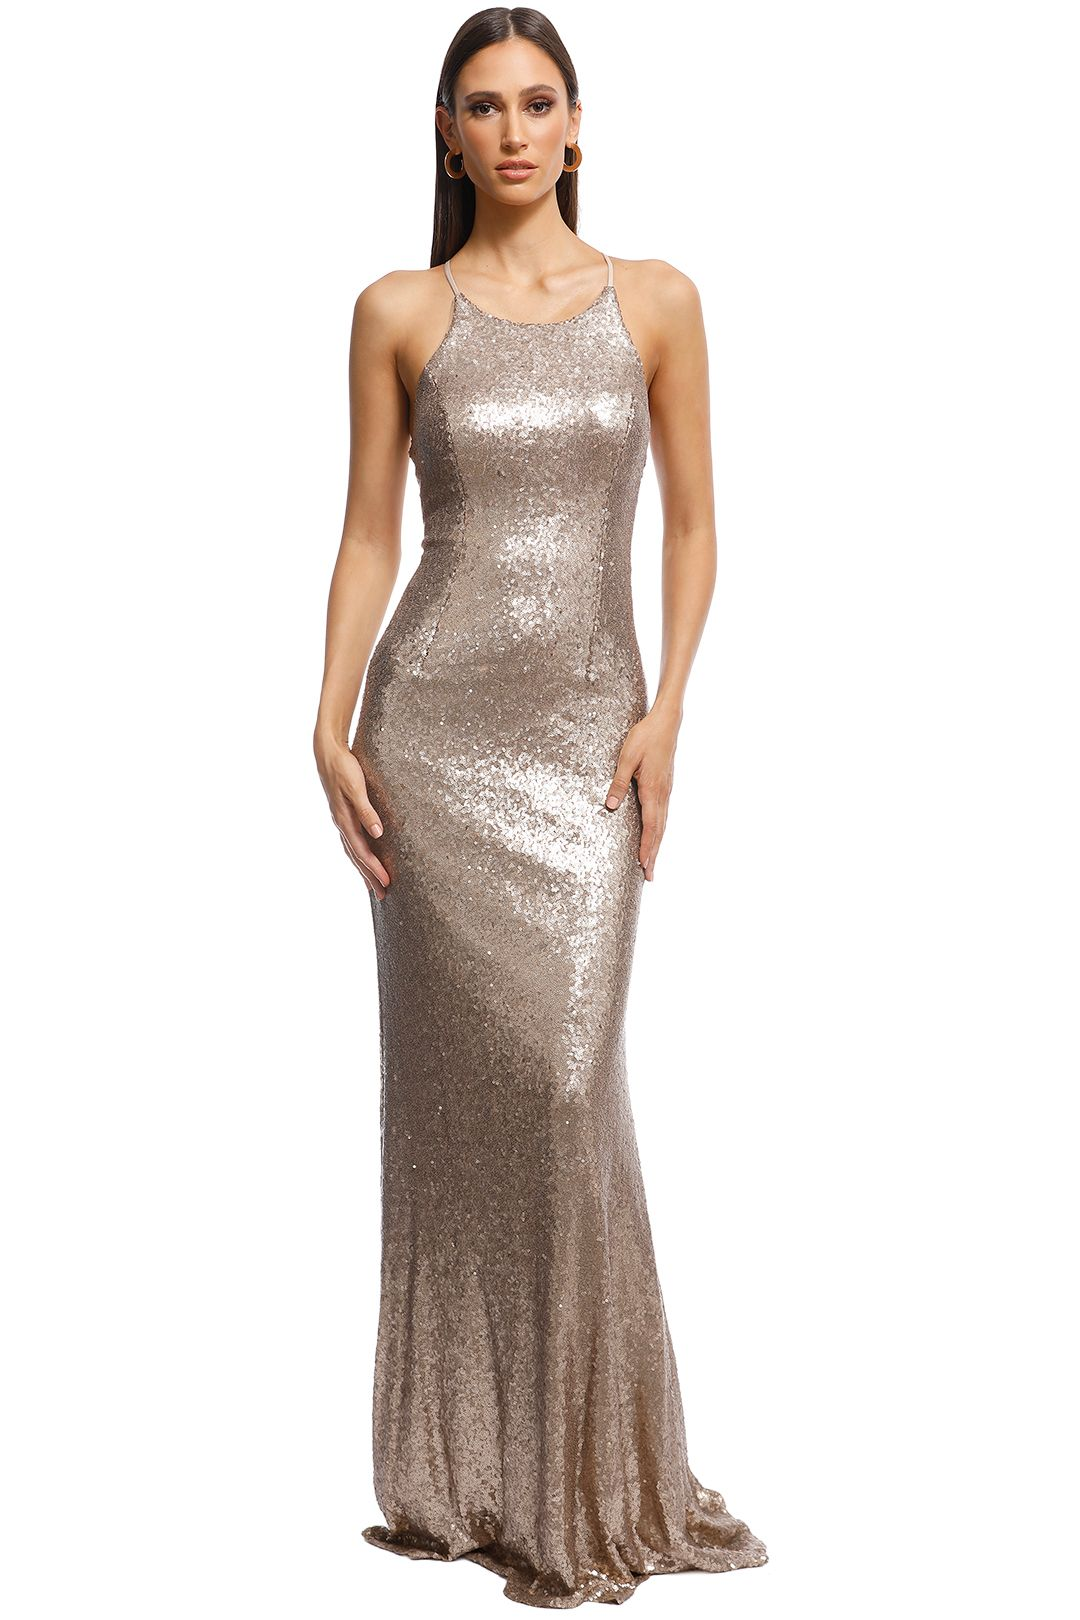 Tania Olsen - Sadie Sequin Gown - Gold - Front